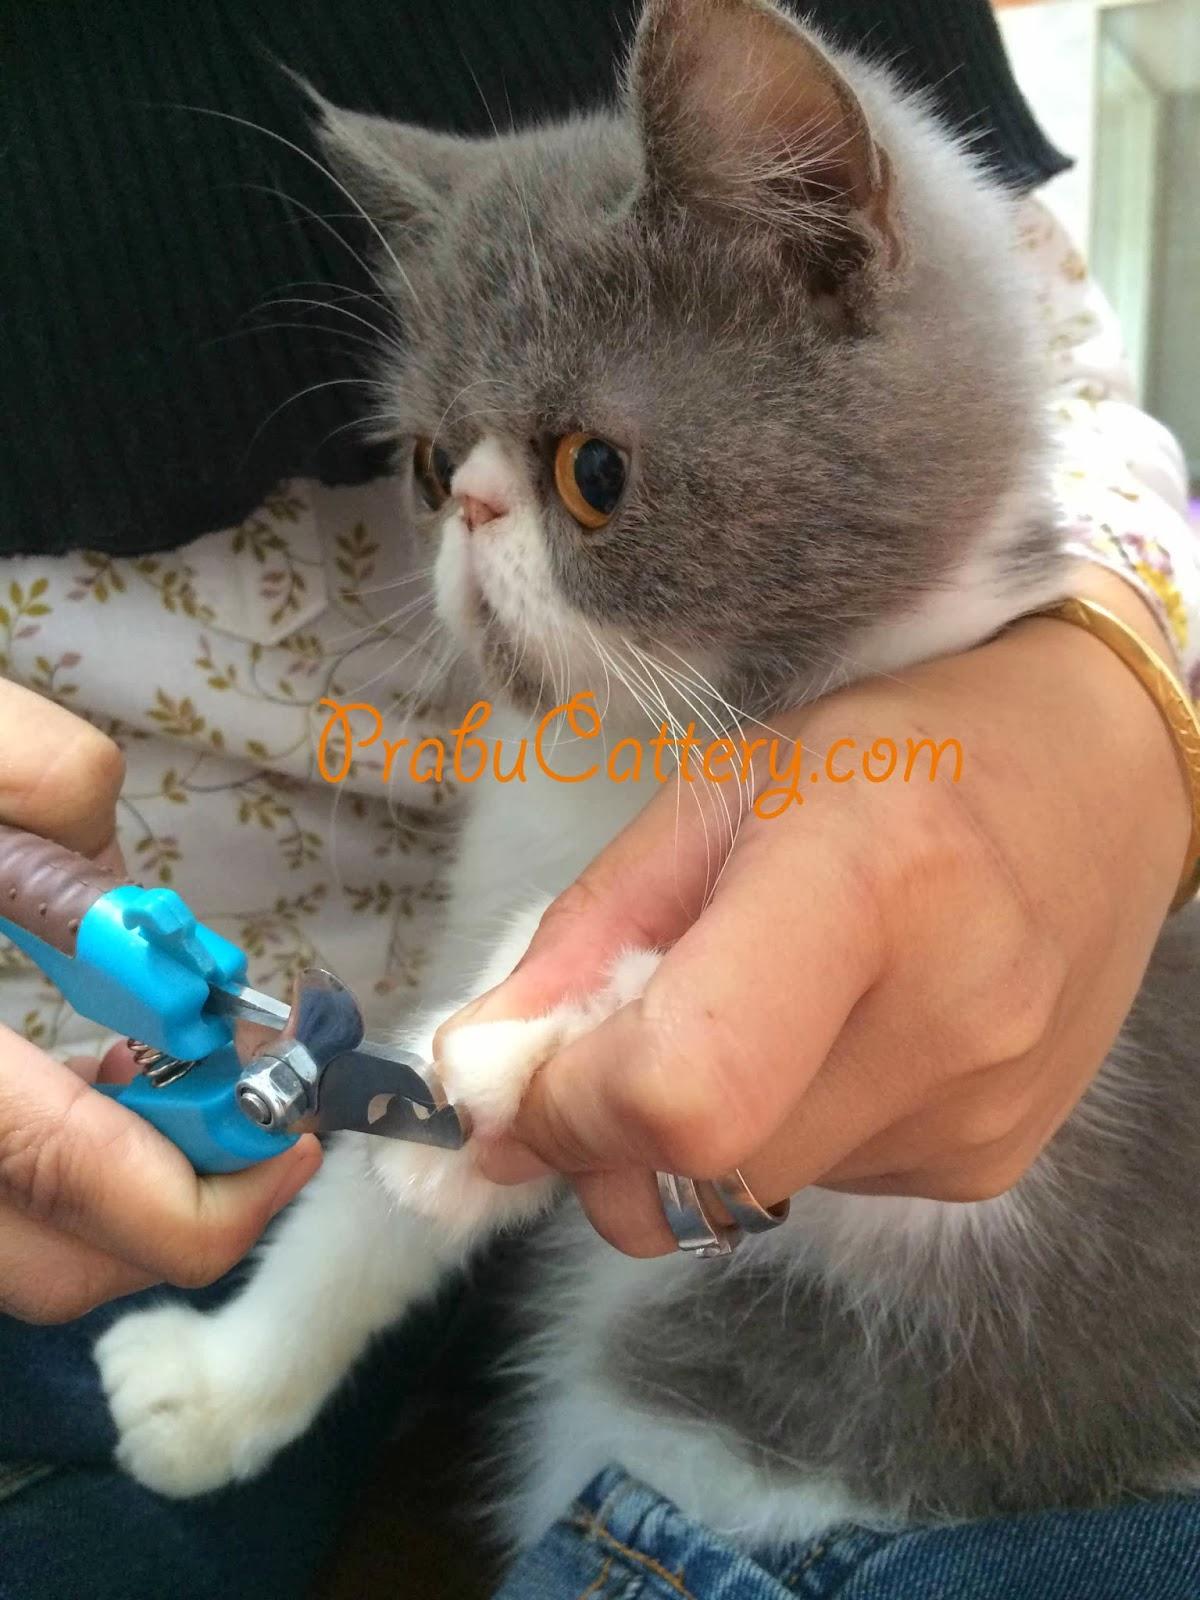 Macam-Macam dan Cara Mengatasi Penyakit Pada Kucing